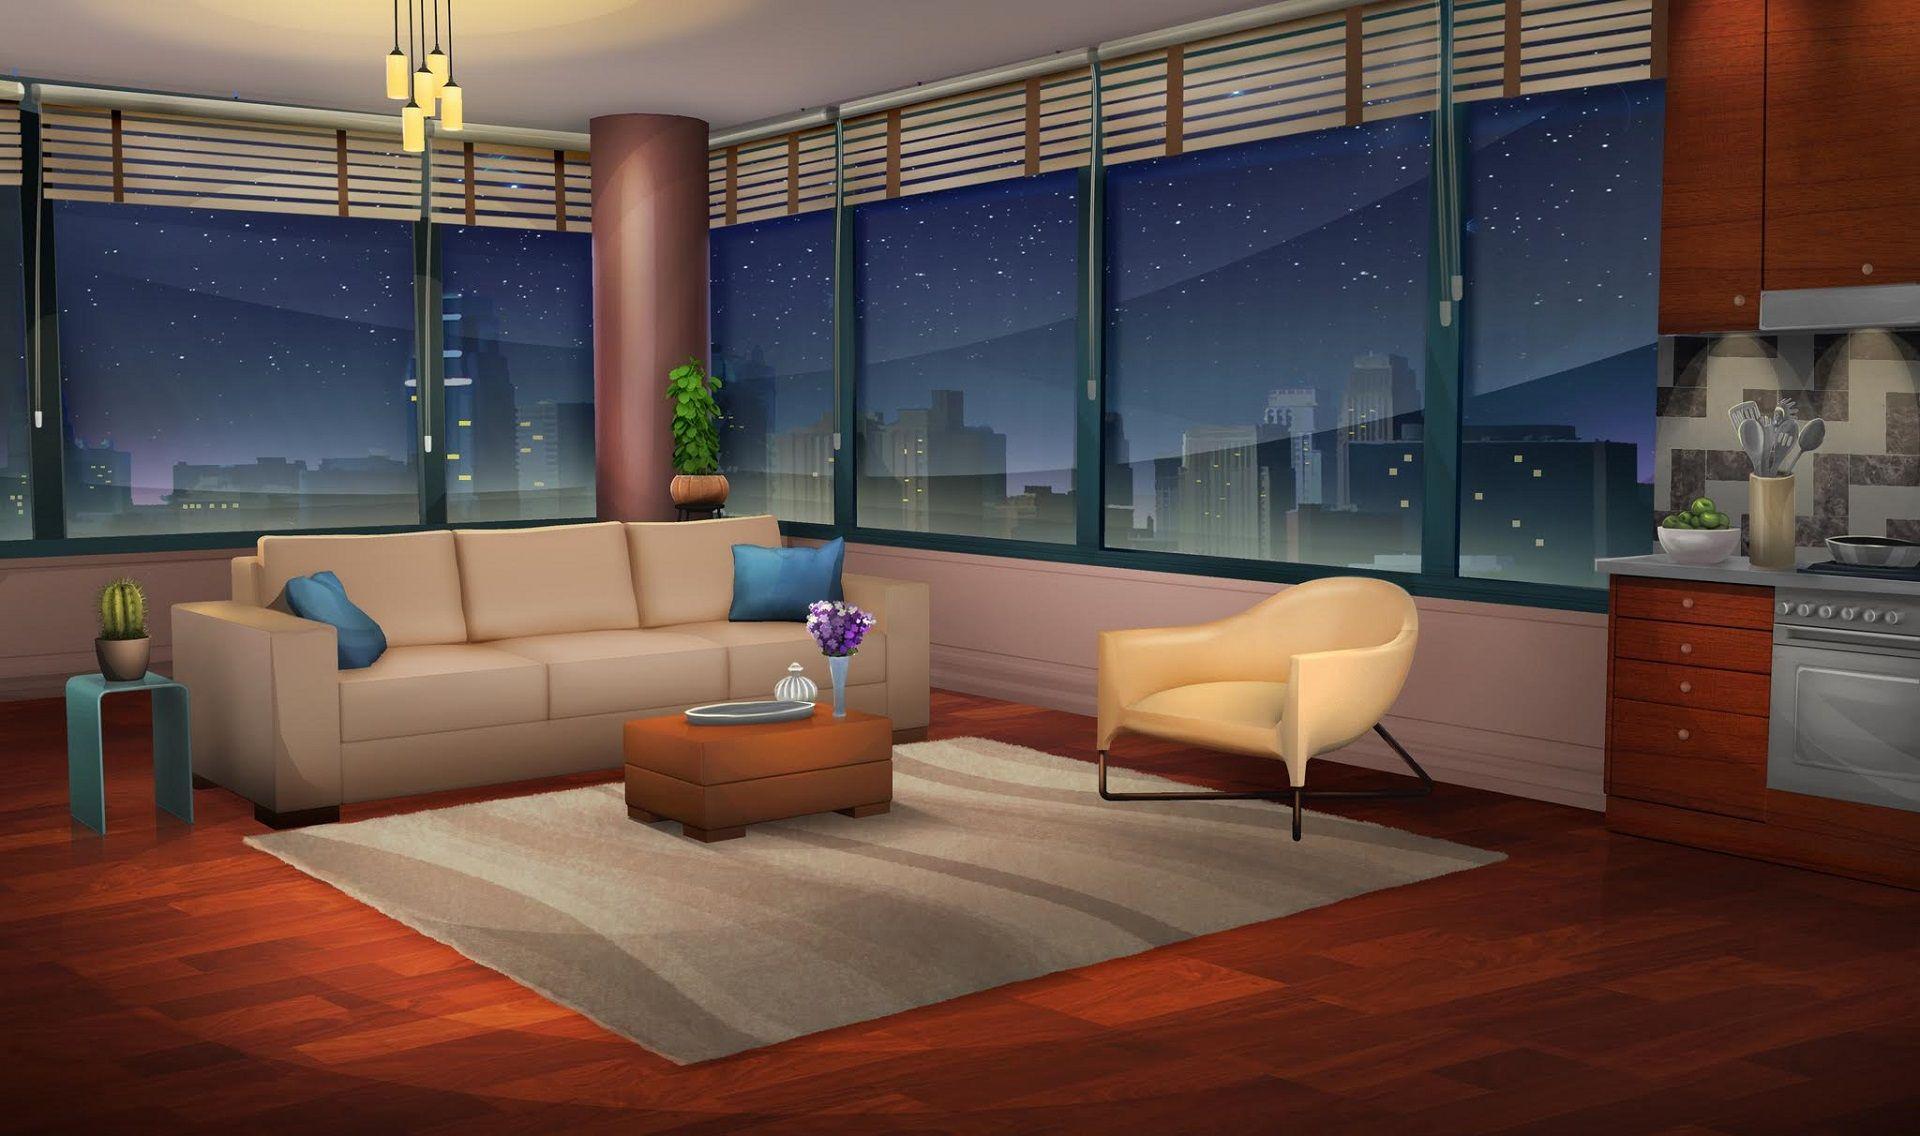 Int La Apartment Night Large Episodeinteractive Episode Size 1920